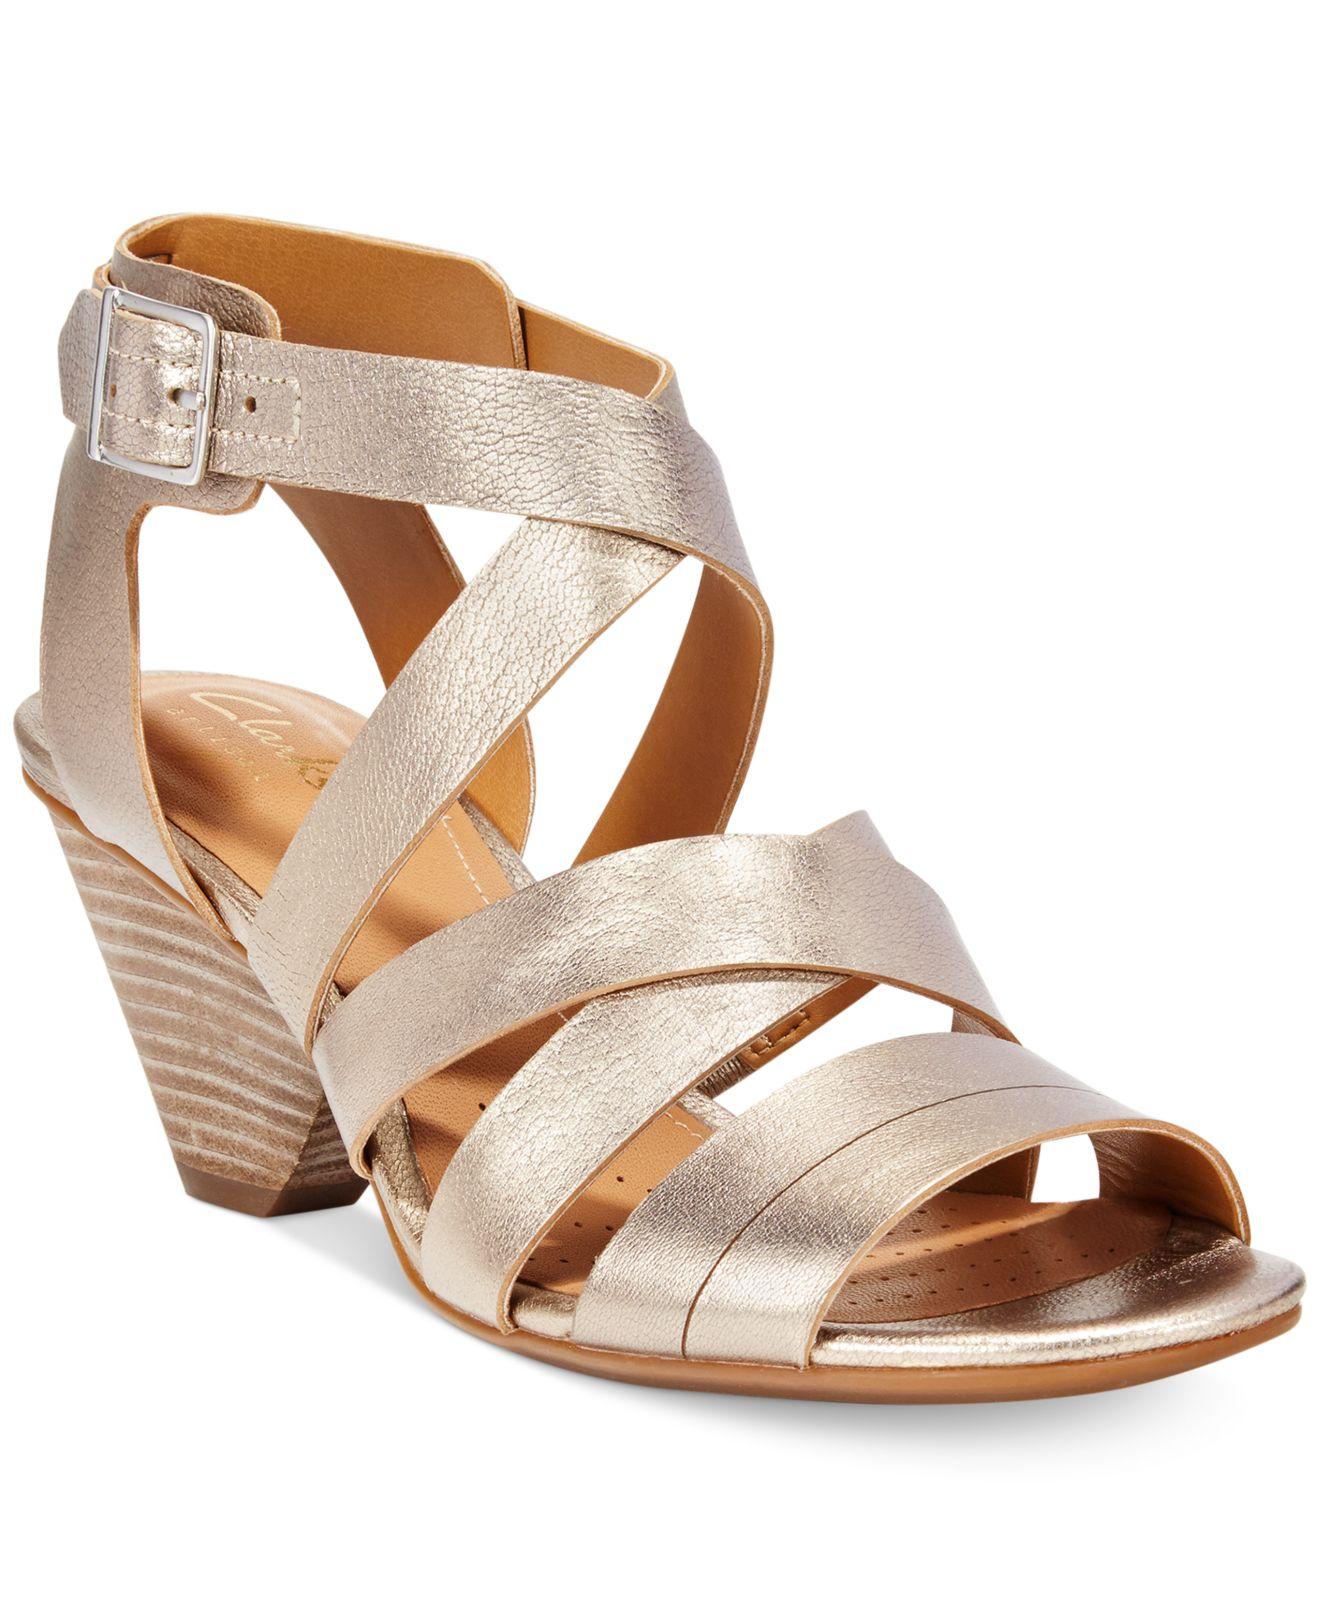 Cool  Naturalizer Dhanny Dress Sandals Women39s Shoes  Shoes  Shop It To Me